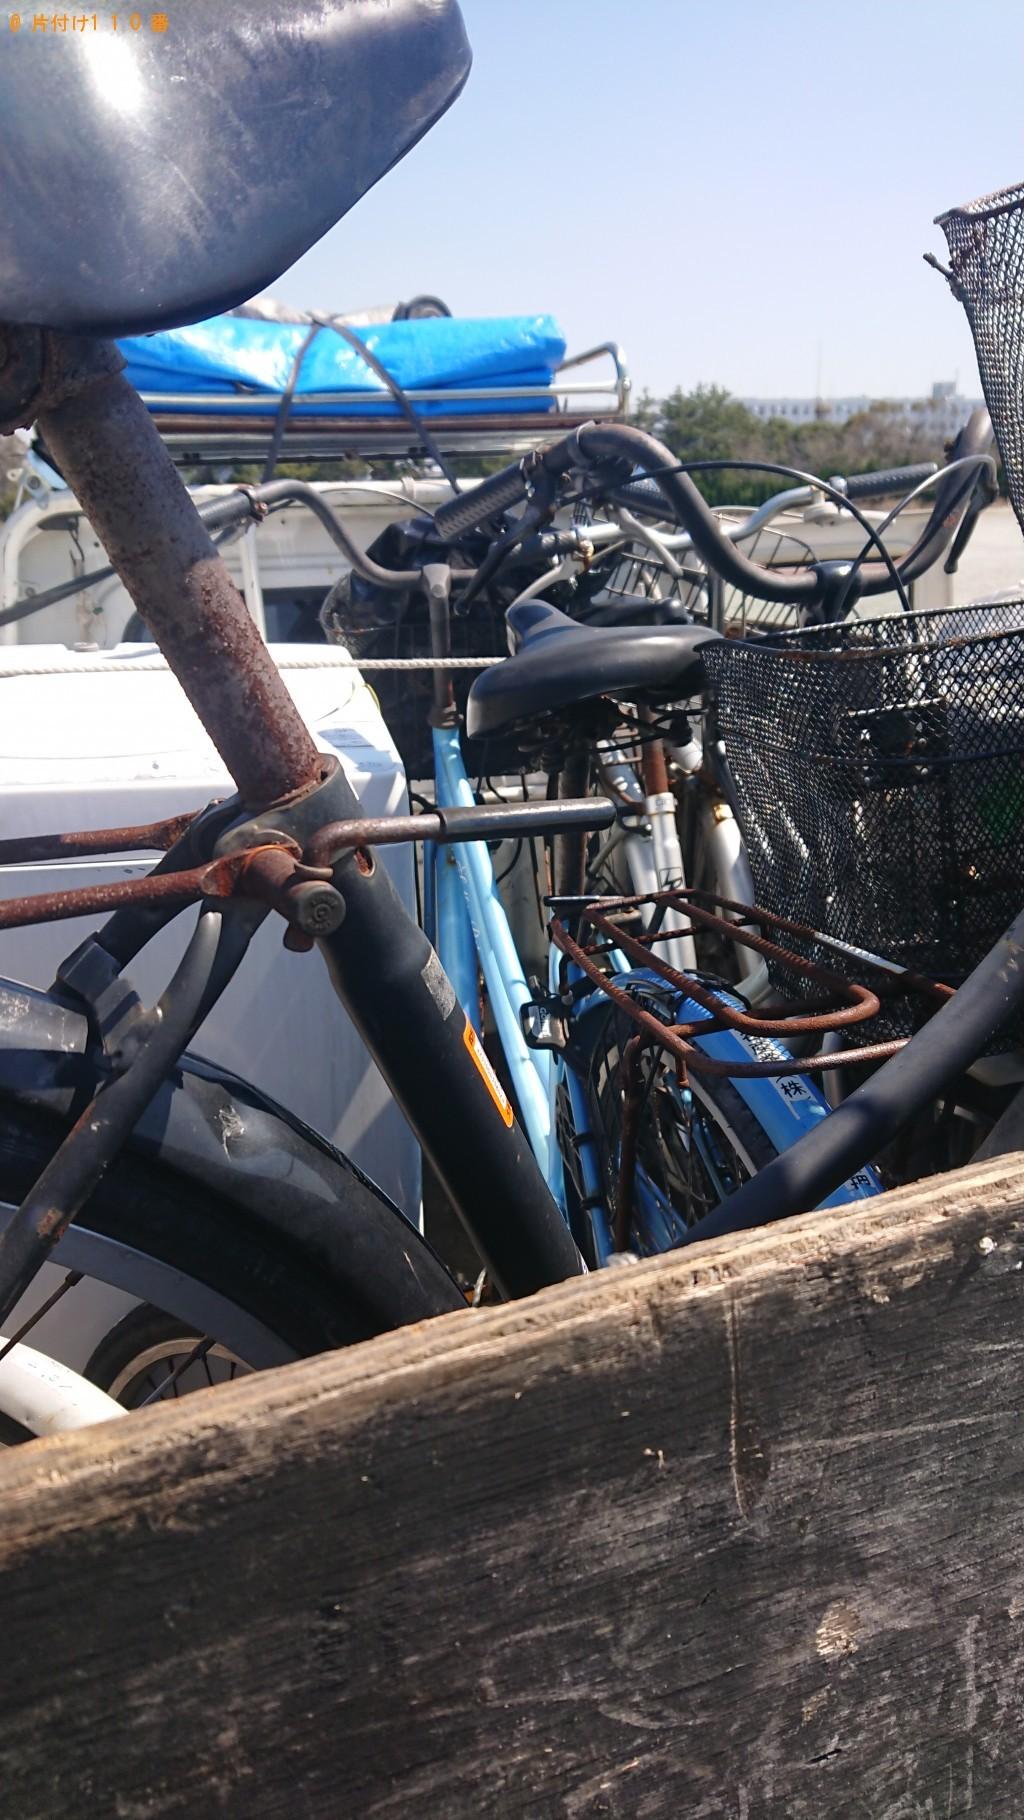 【堺市西区】洗濯機、自転車の回収・処分ご依頼 お客様の声